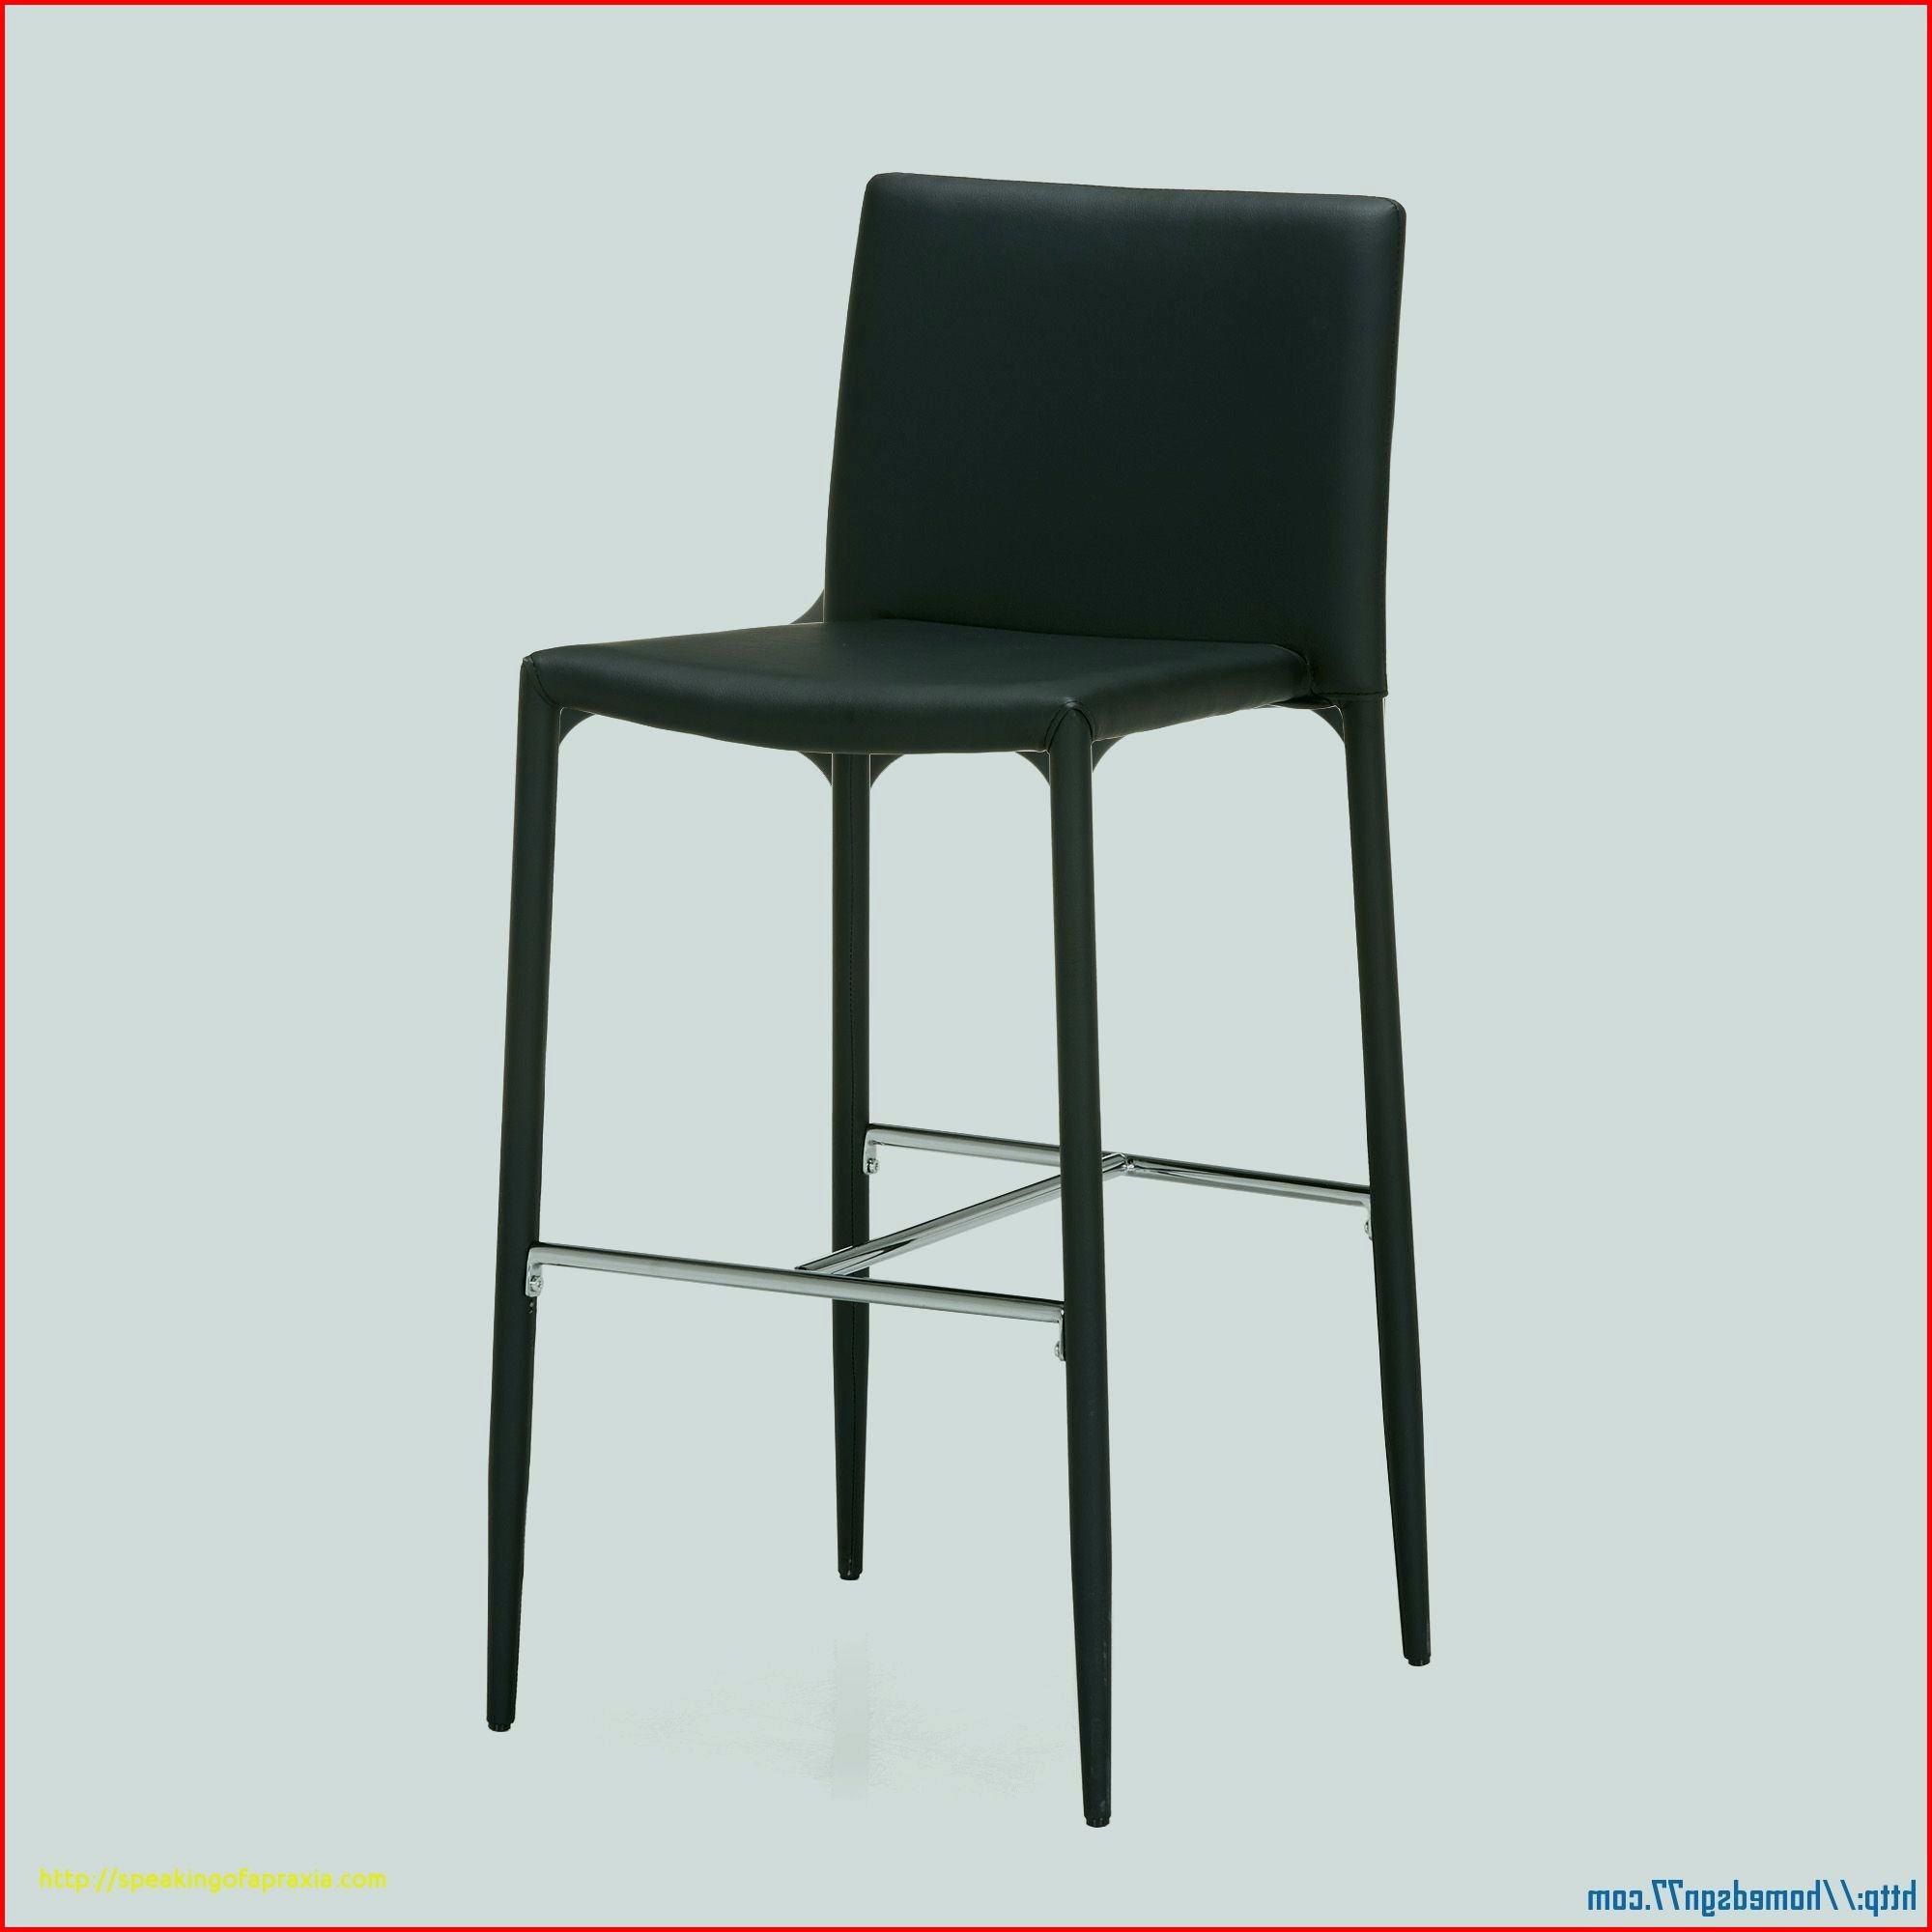 Chaises Alinea Salle A Manger evolutive bois bois chaise chaise chaise haute alinea haute